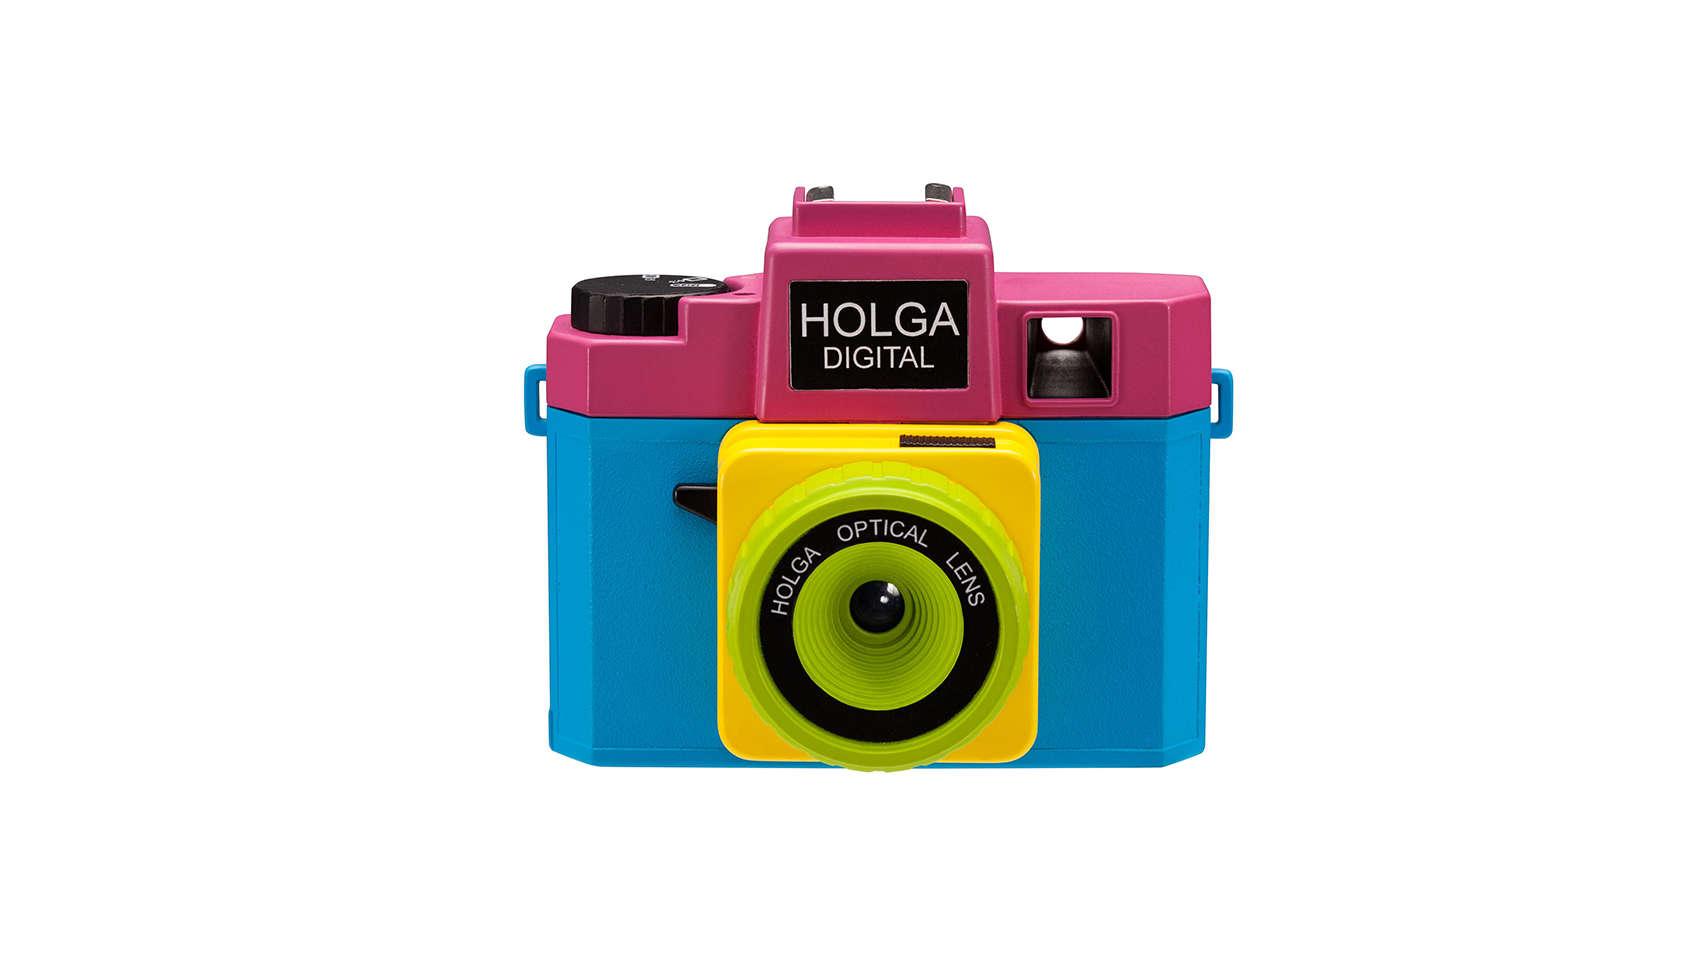 The classic Holga camera finally goes digital | Cult of Mac